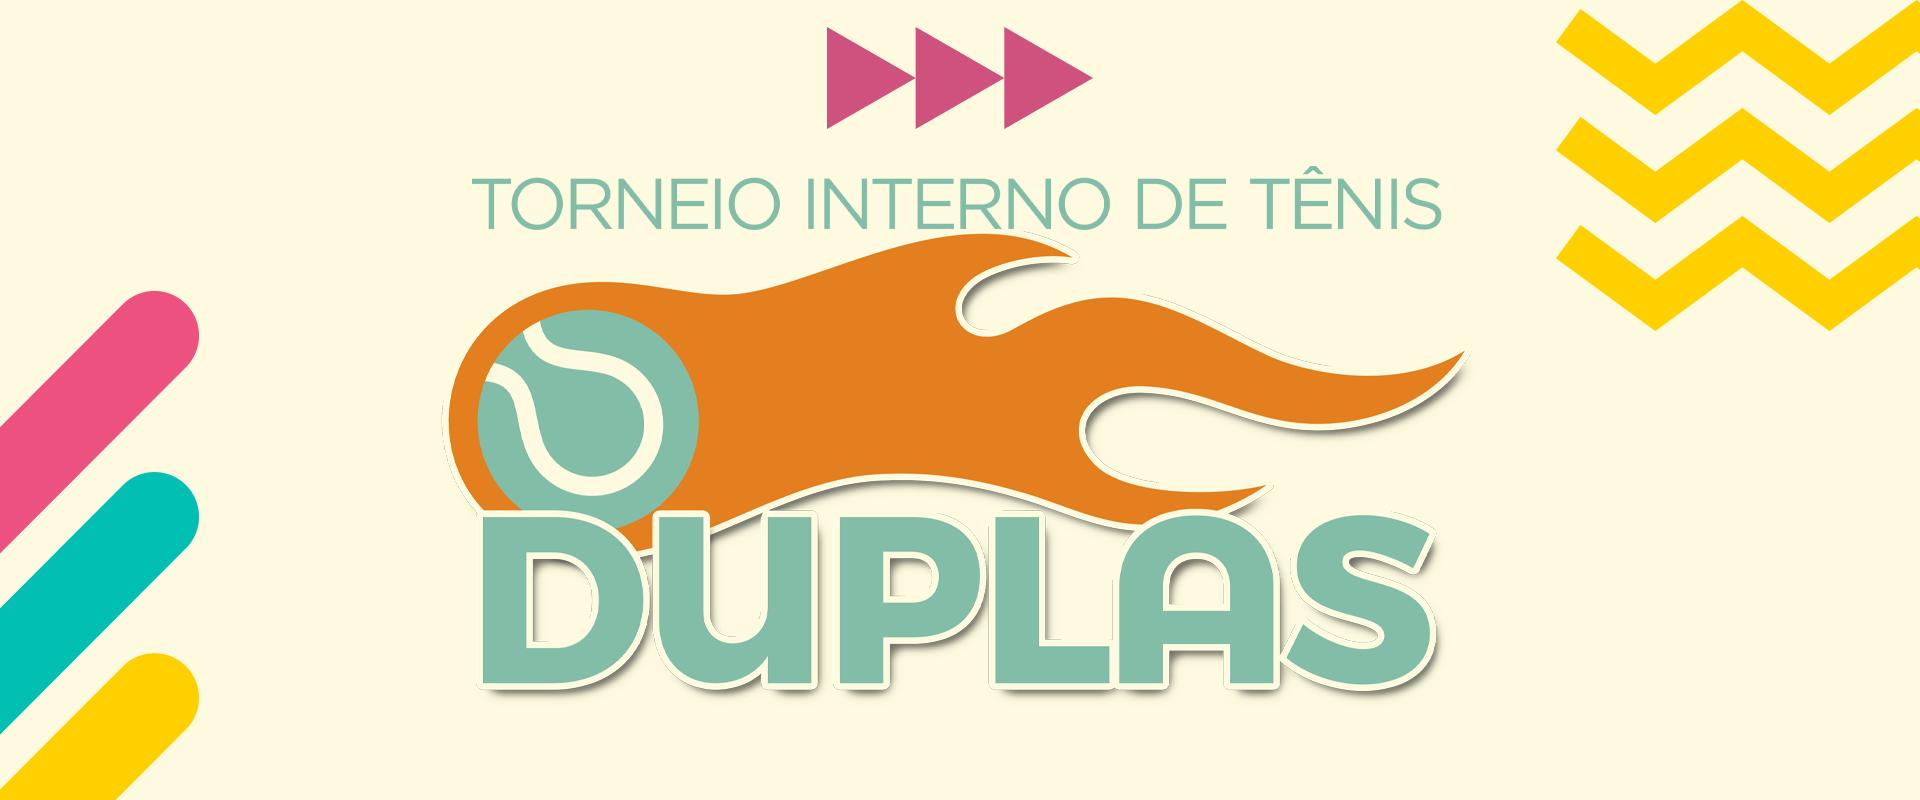 site_torneio interno tênis duplas_banner